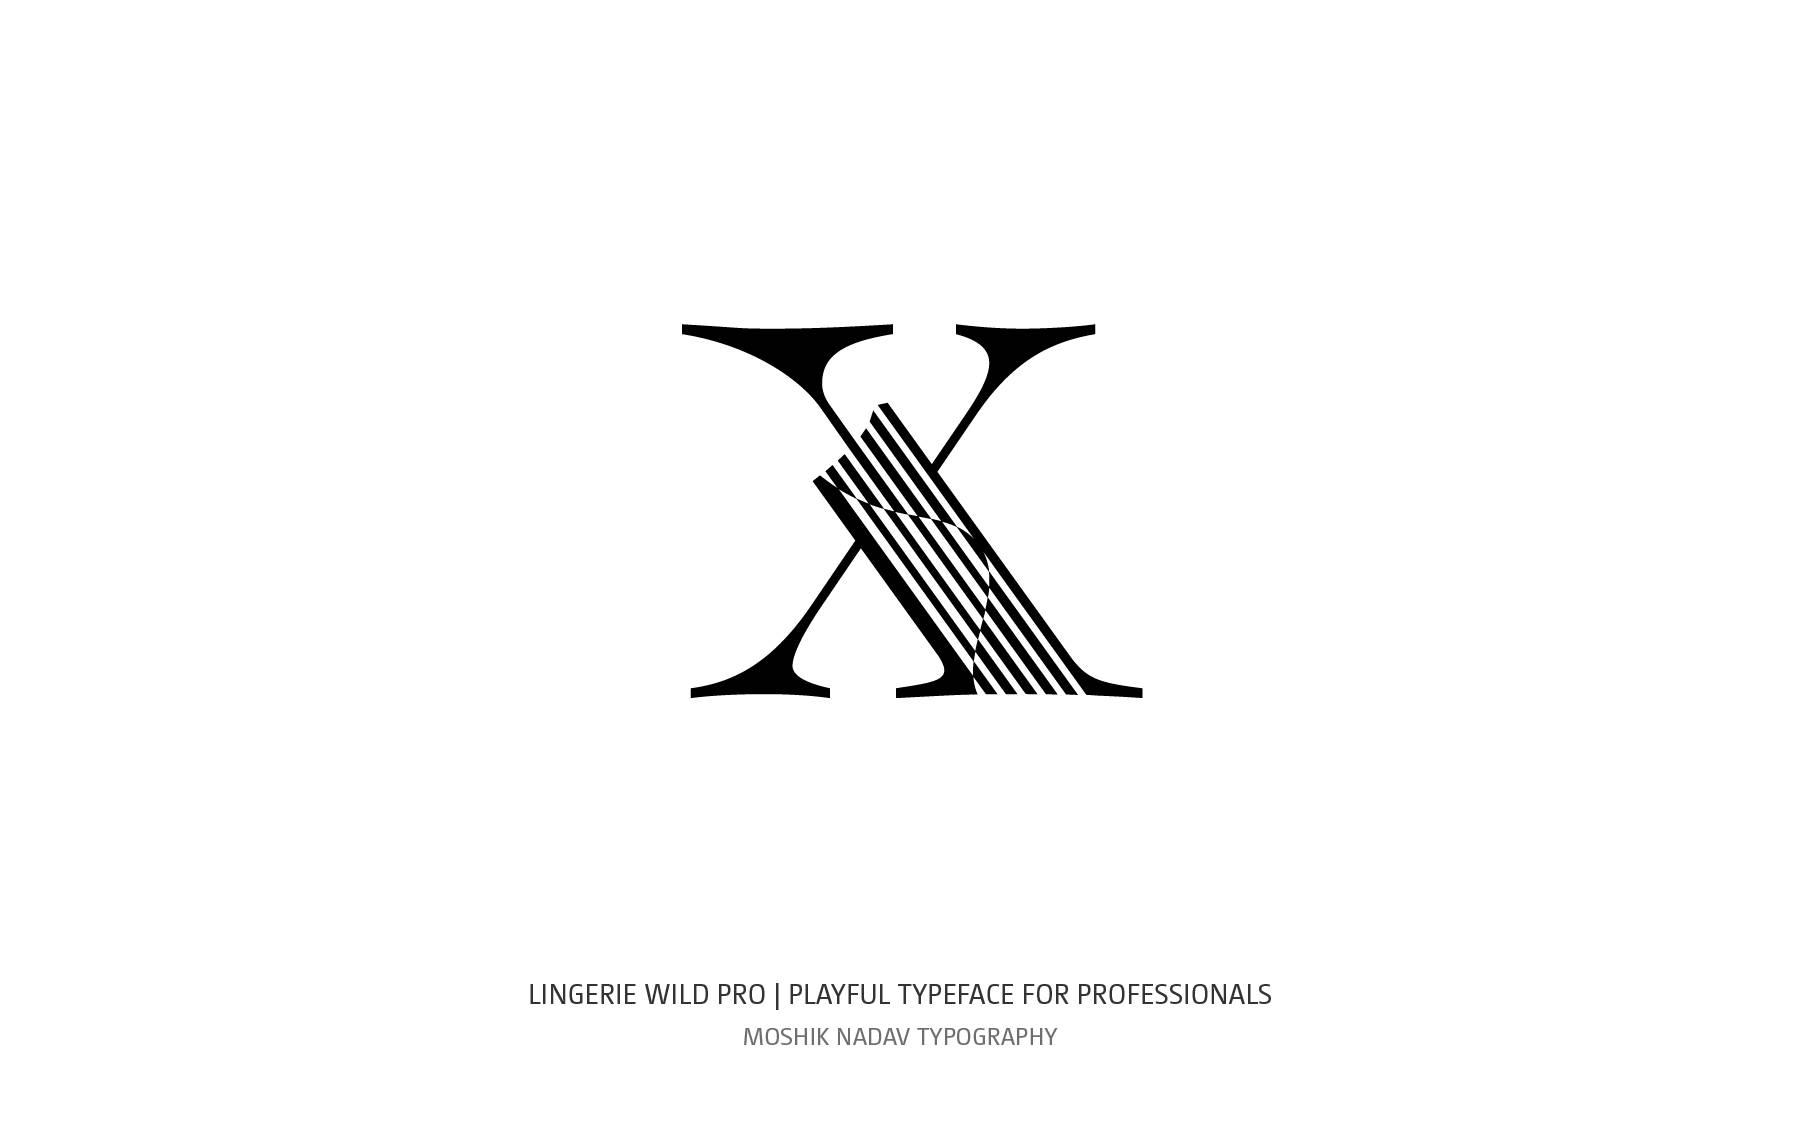 Lingerie Wild Pro Typeface designed by Moshik Nadav Fashion Typography